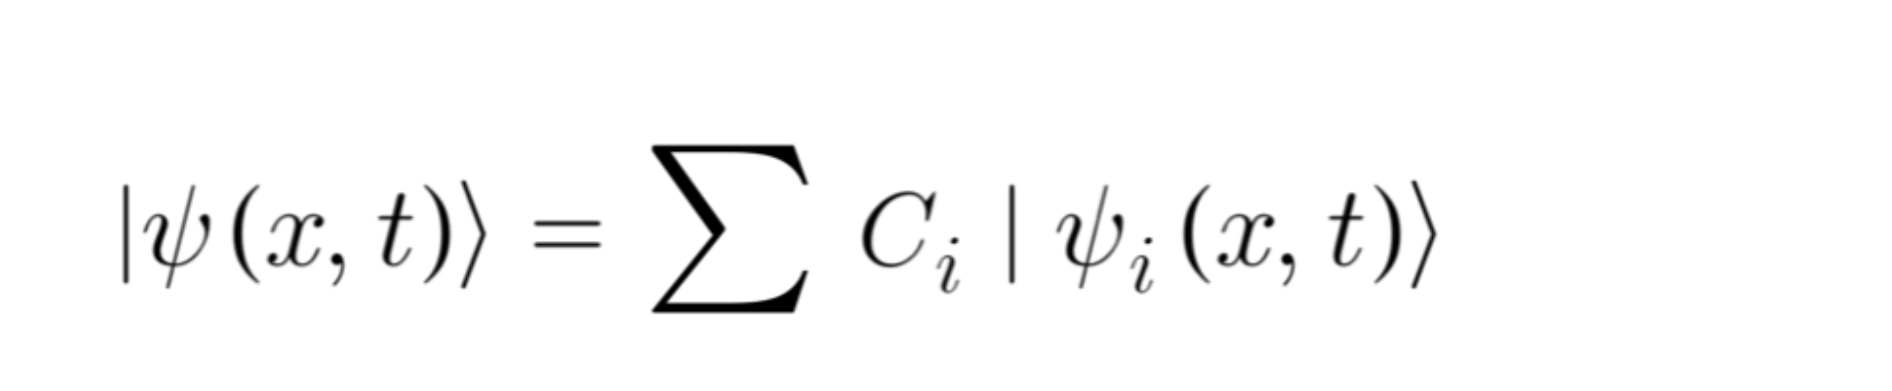 BC4C4B2D-0614-41F5-BECD-8C39C961AE5A.jpeg